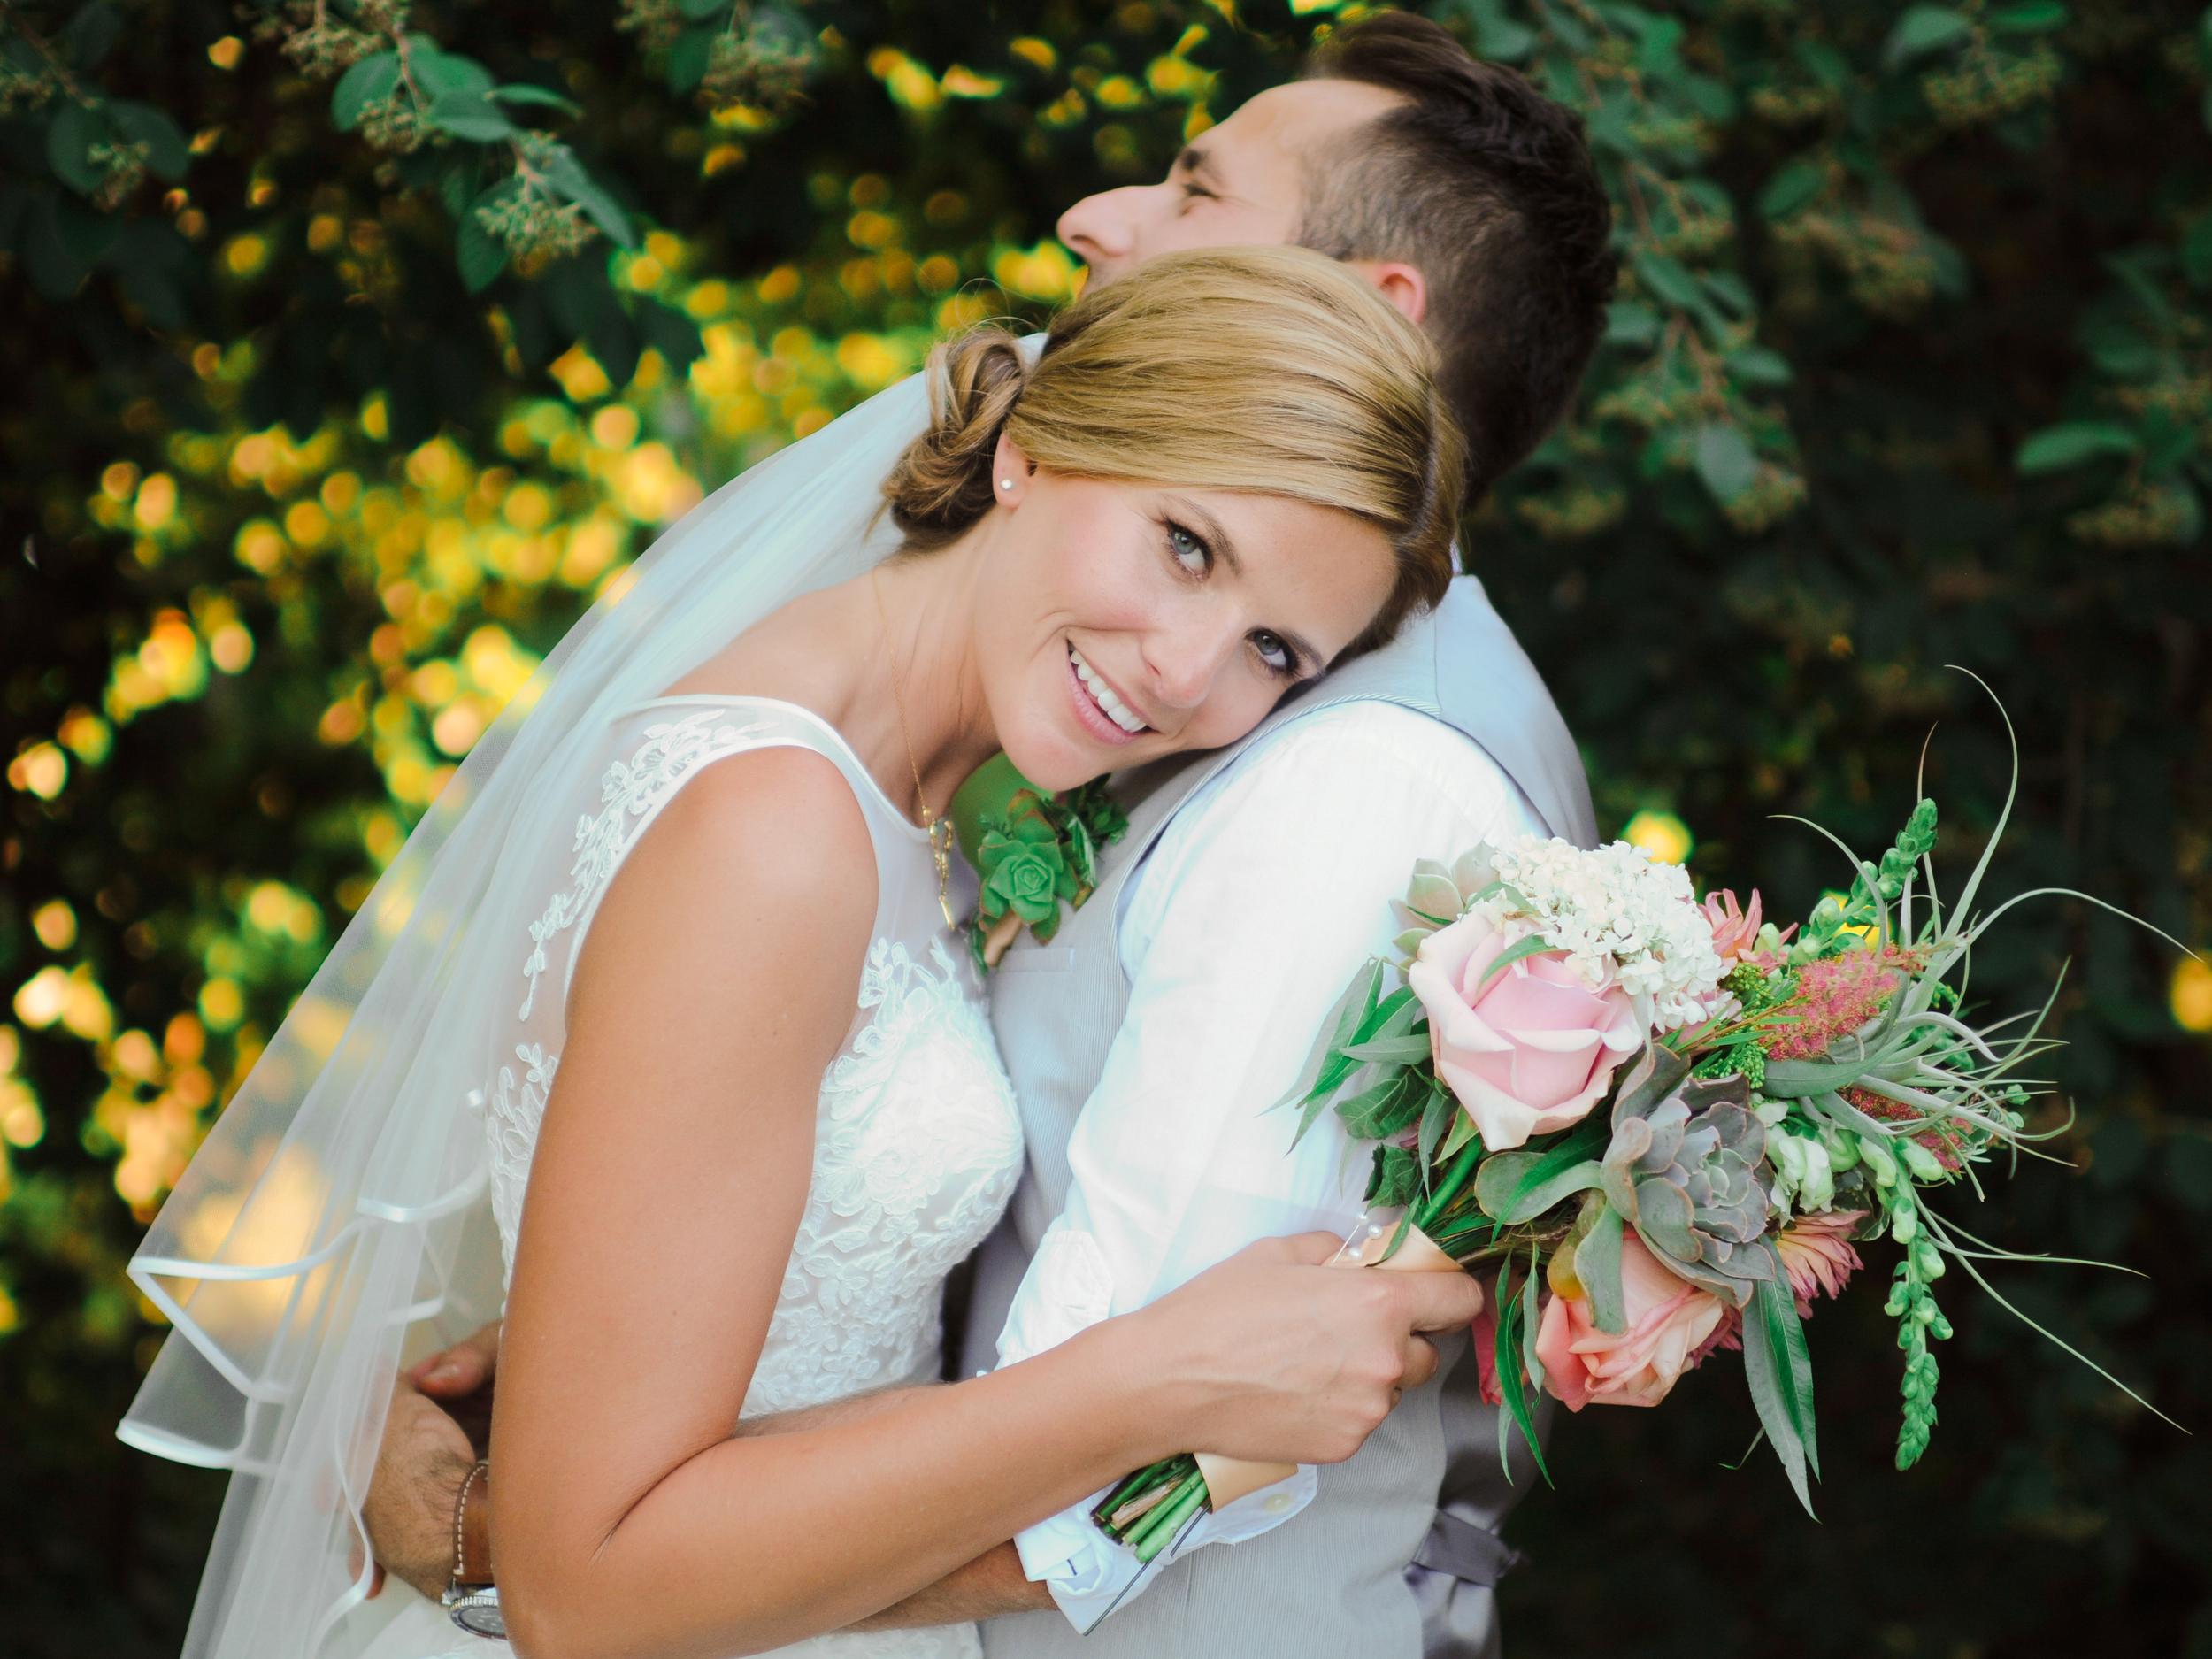 Anders Wedding by Jessica Garmon-481.JPG